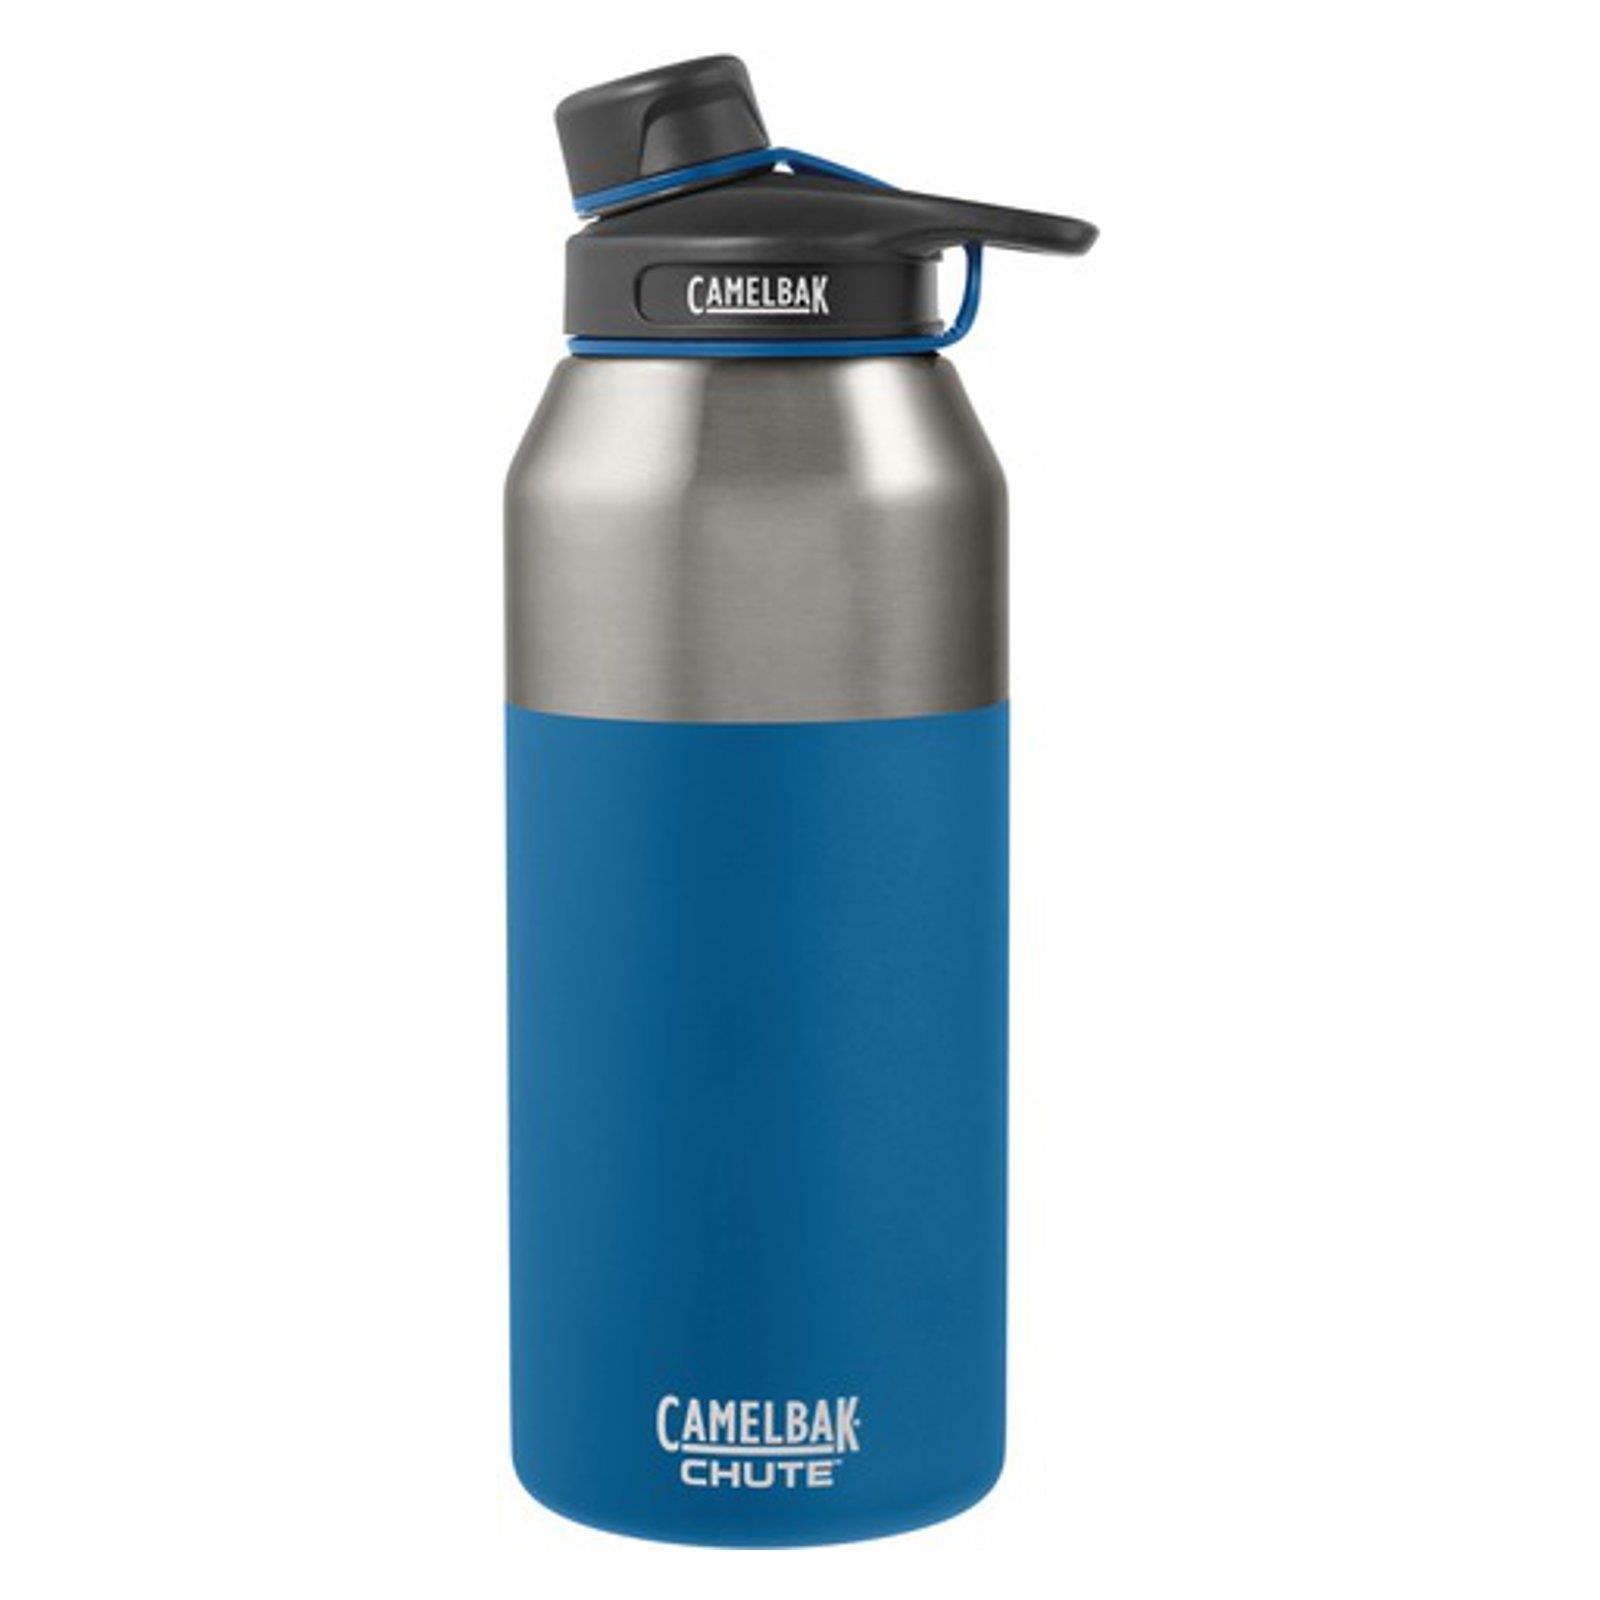 Camelbak-Trink-Isolier-Flasche-Chute-Vacuum-Thermo-Becher-Kanne-Outdoor Indexbild 15